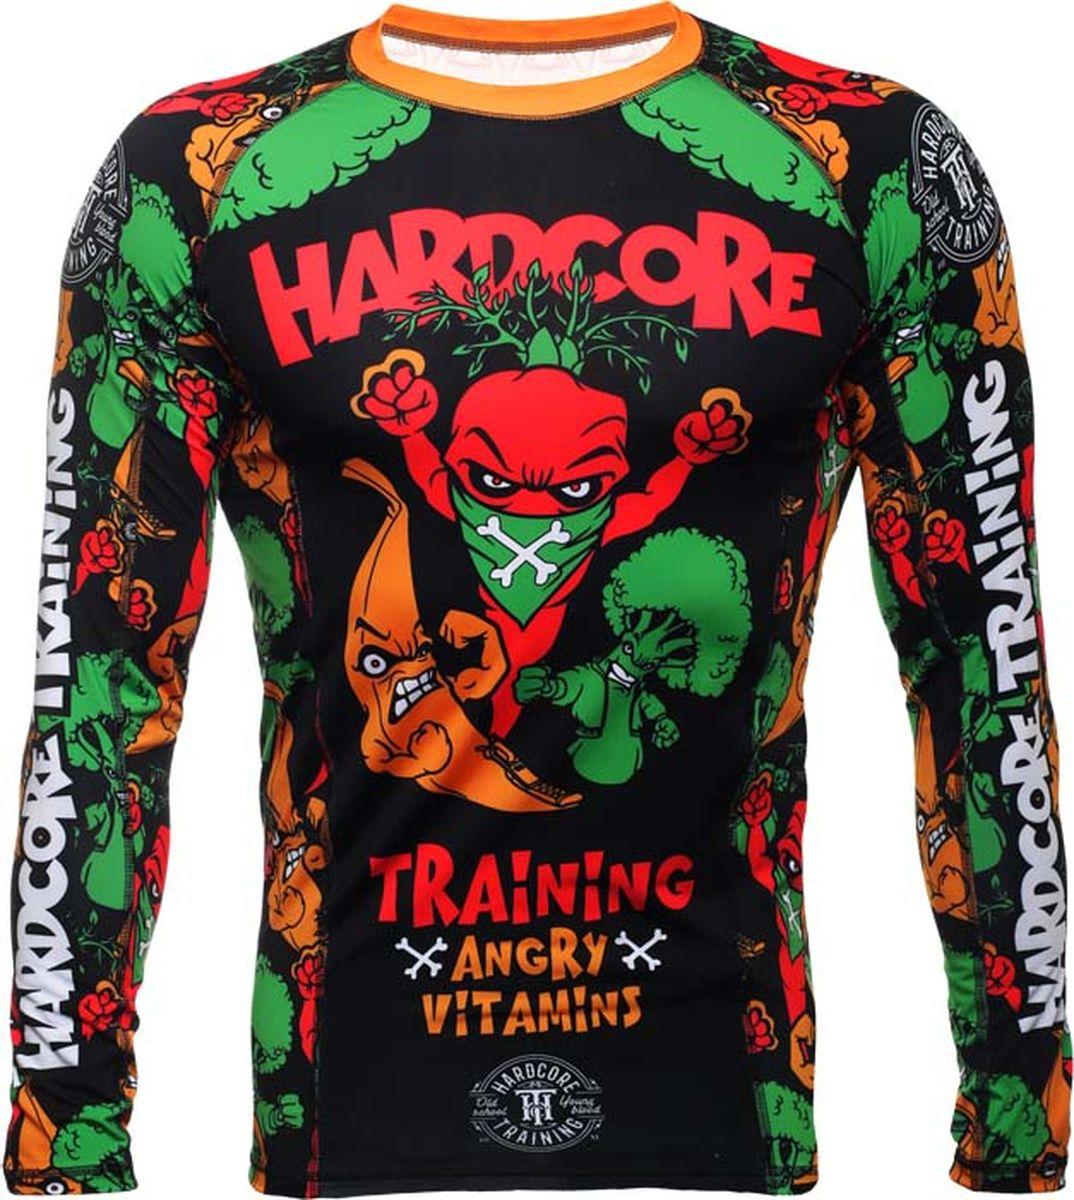 Фото - Рашгард Hardcore Training шорты мужские hardcore training angry vitamins цвет черный hctshorts057 размер 3xl 56